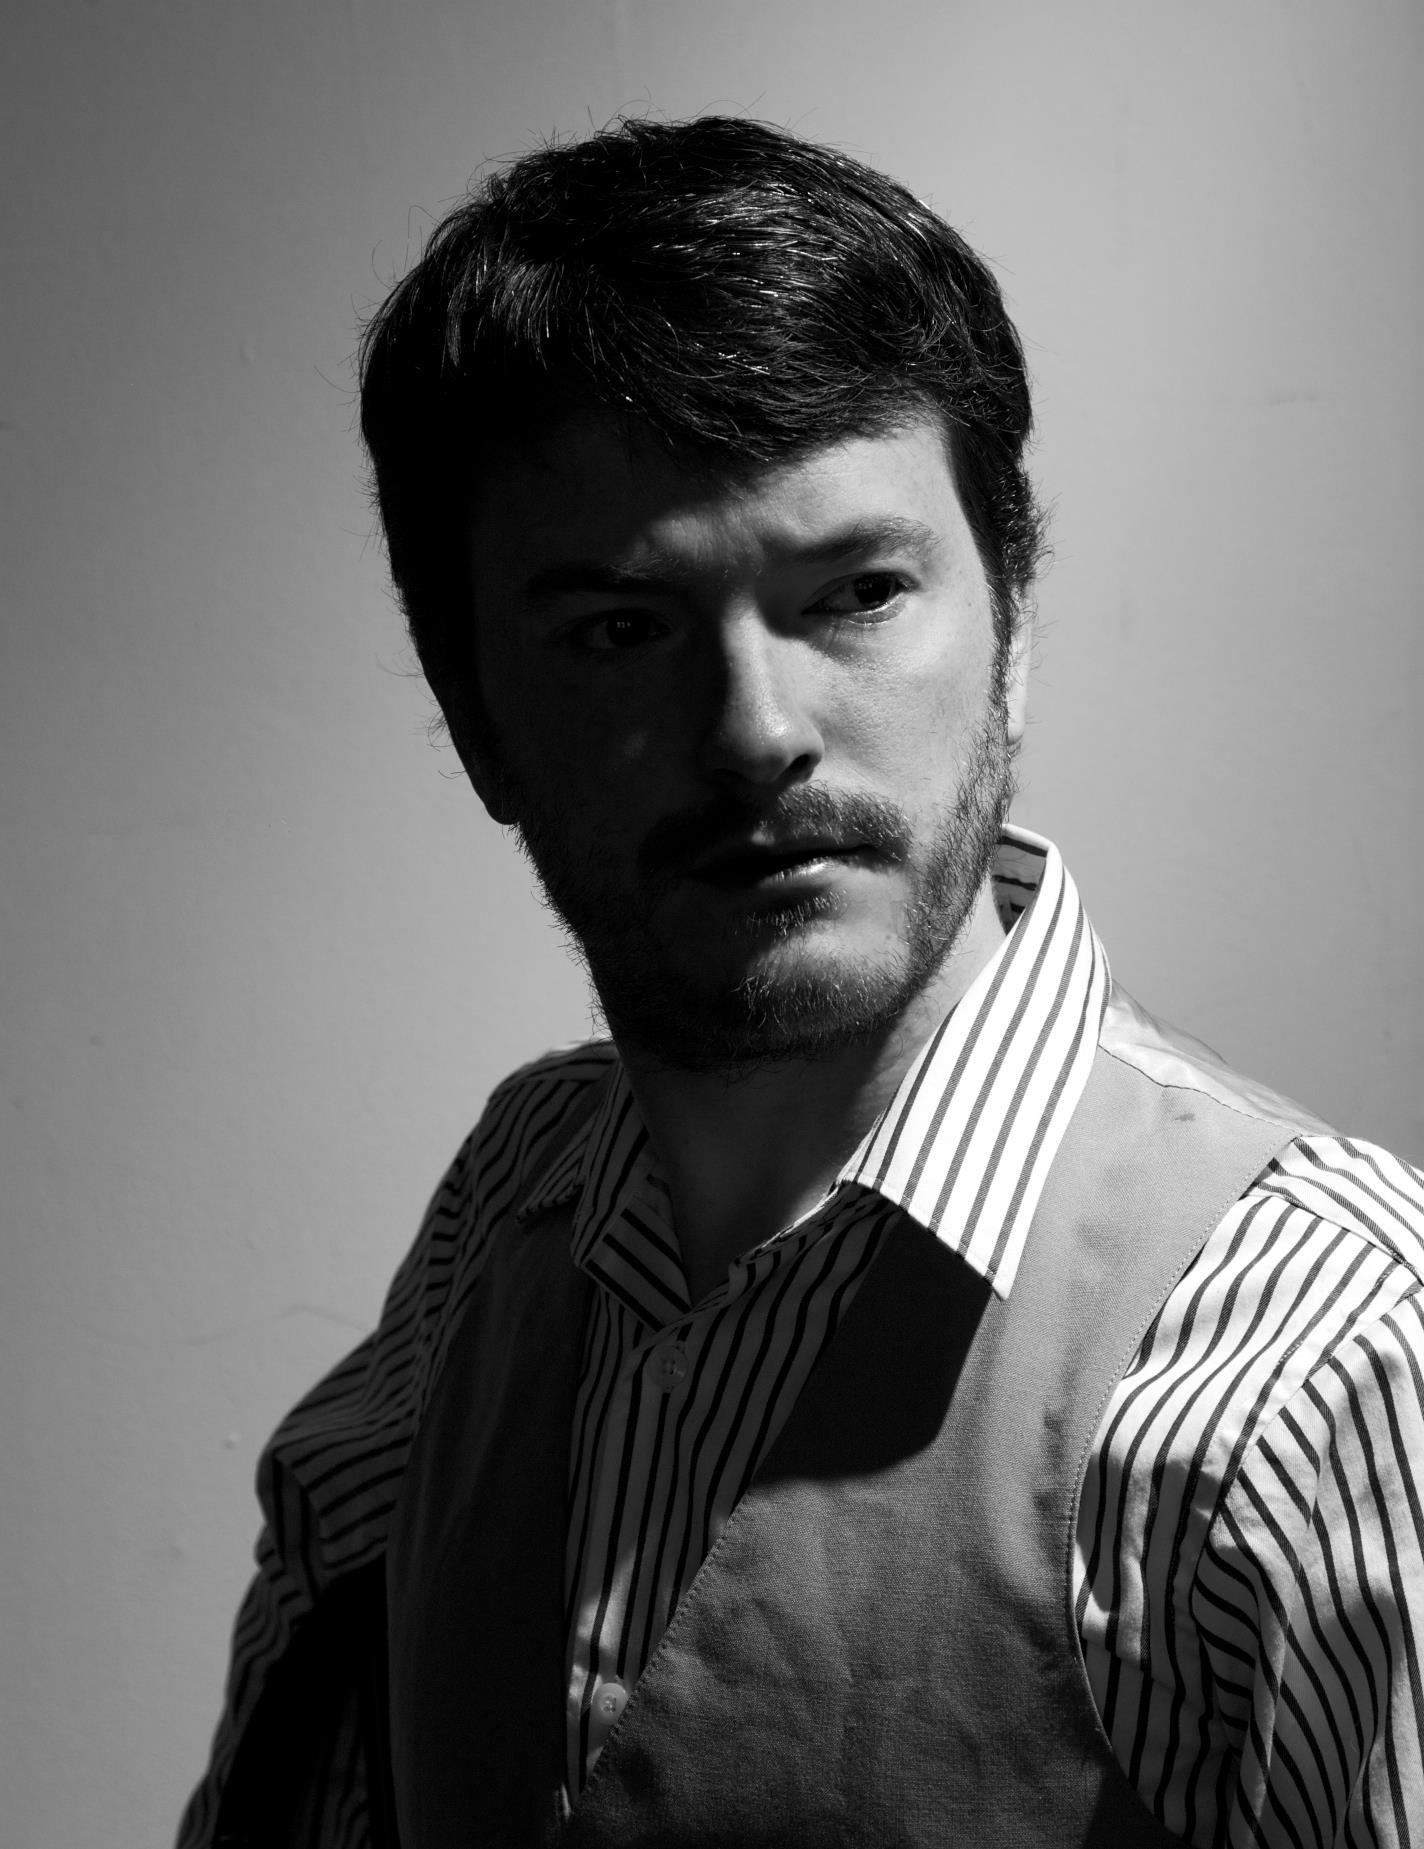 Shawn Graham - Self Portrait